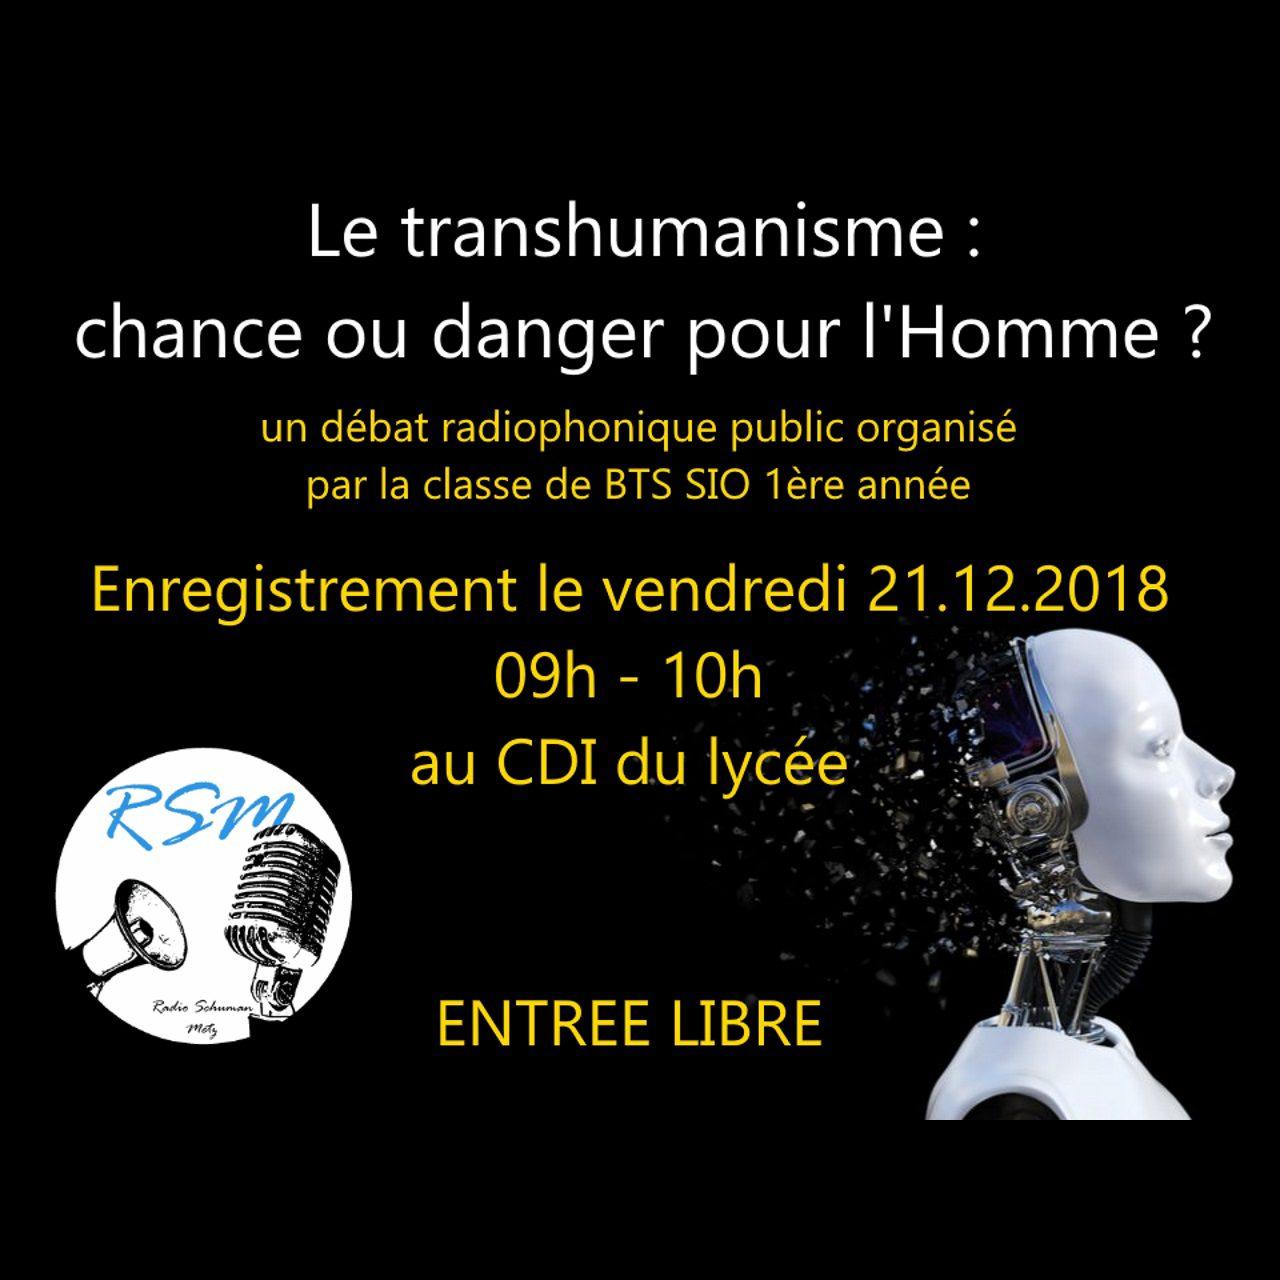 transhumanisme_carre.jpg